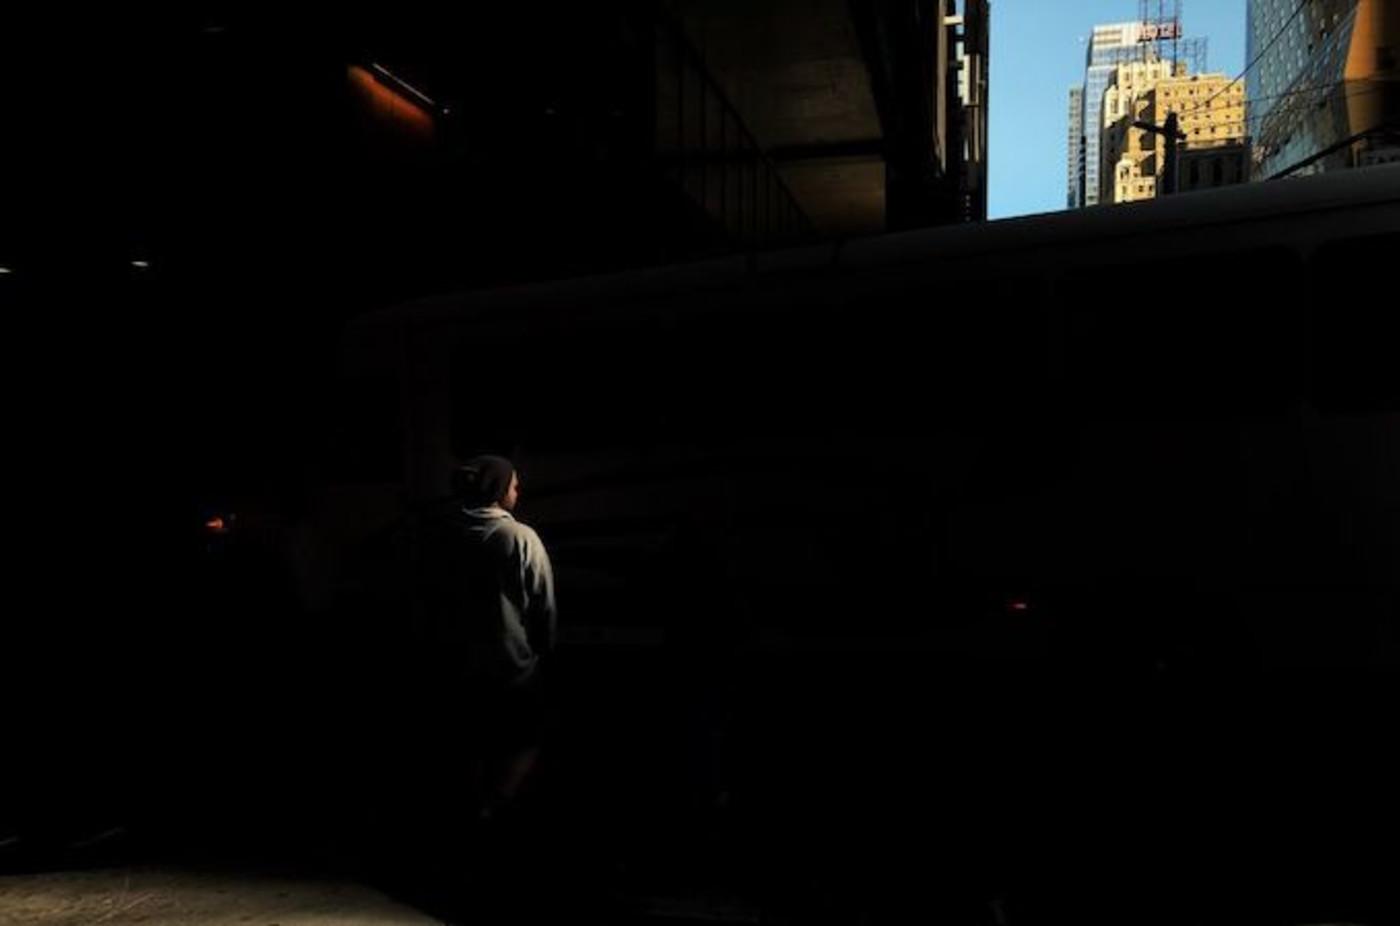 shadow-man-new-york